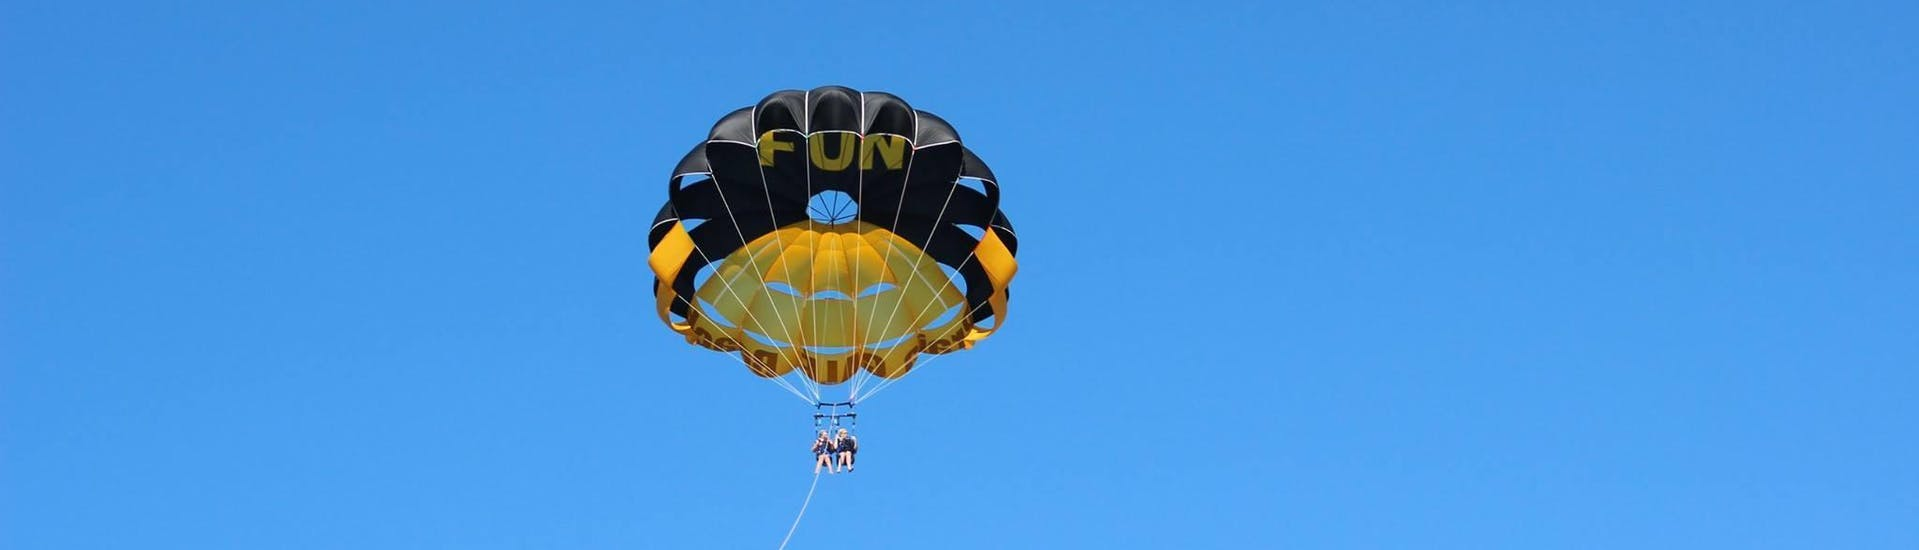 parasailing-upto-3-people-albufeira-nautifun-gale-hero